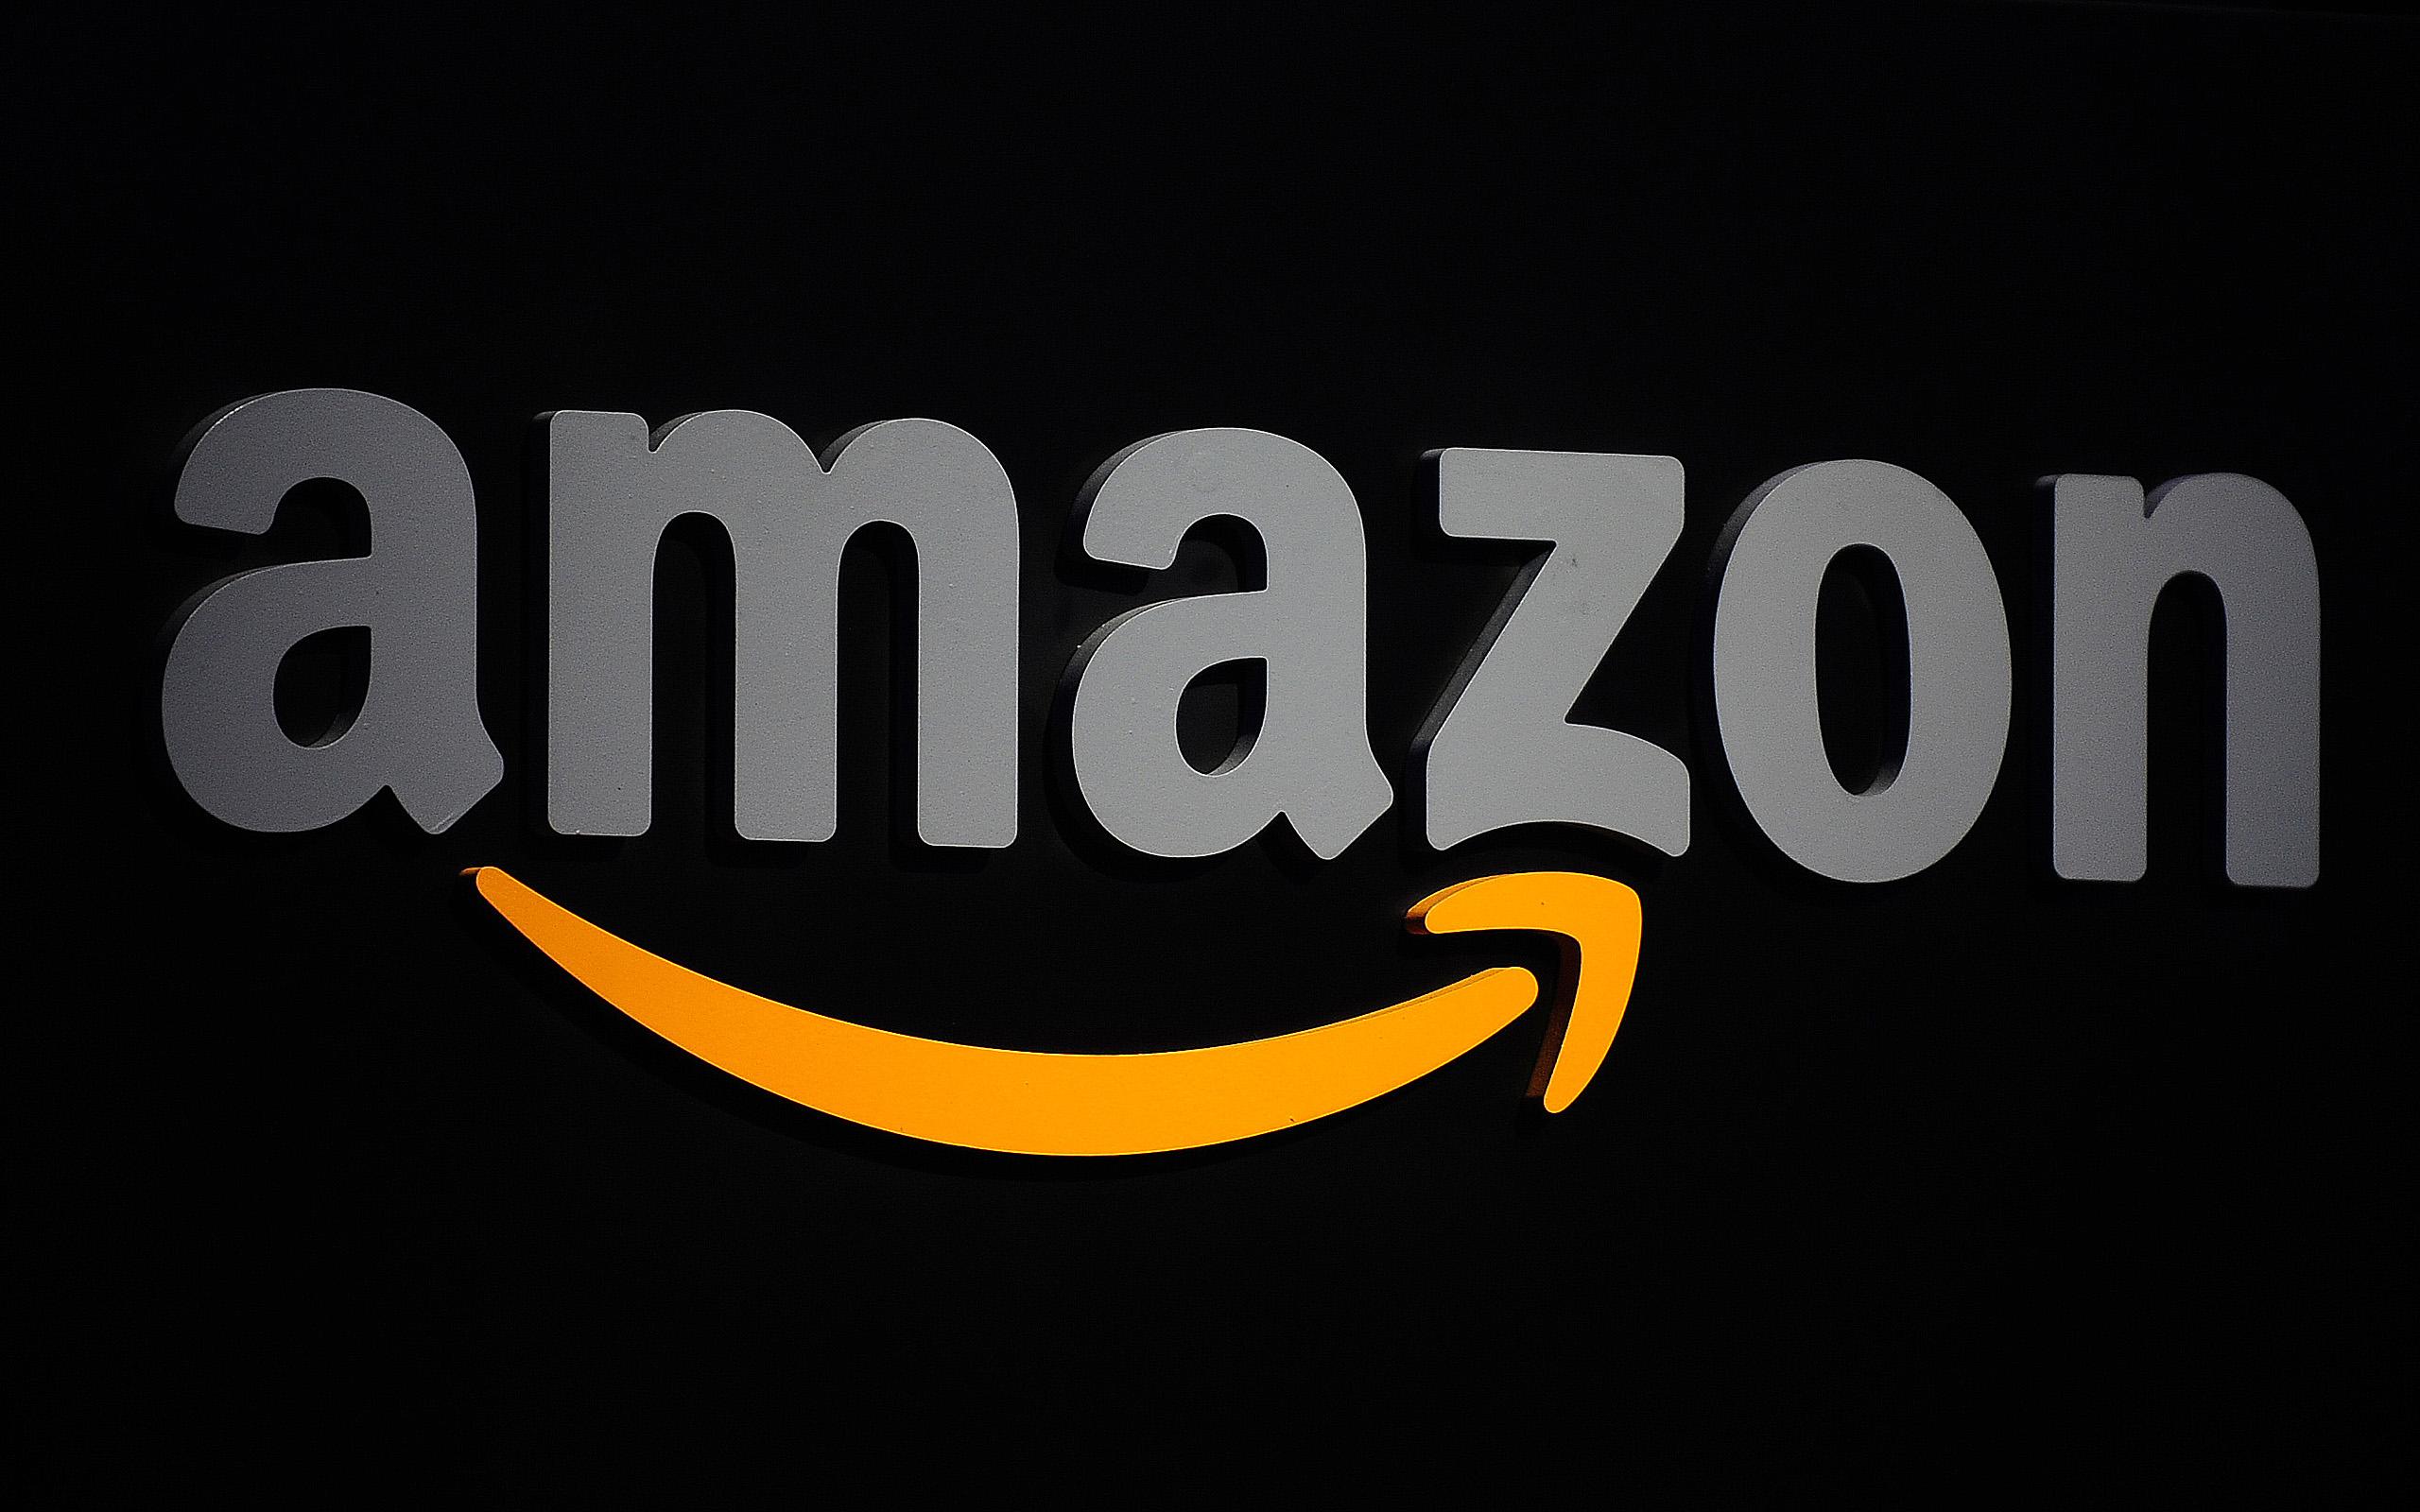 logo, amazon, амазон, бренды, логотип, hd